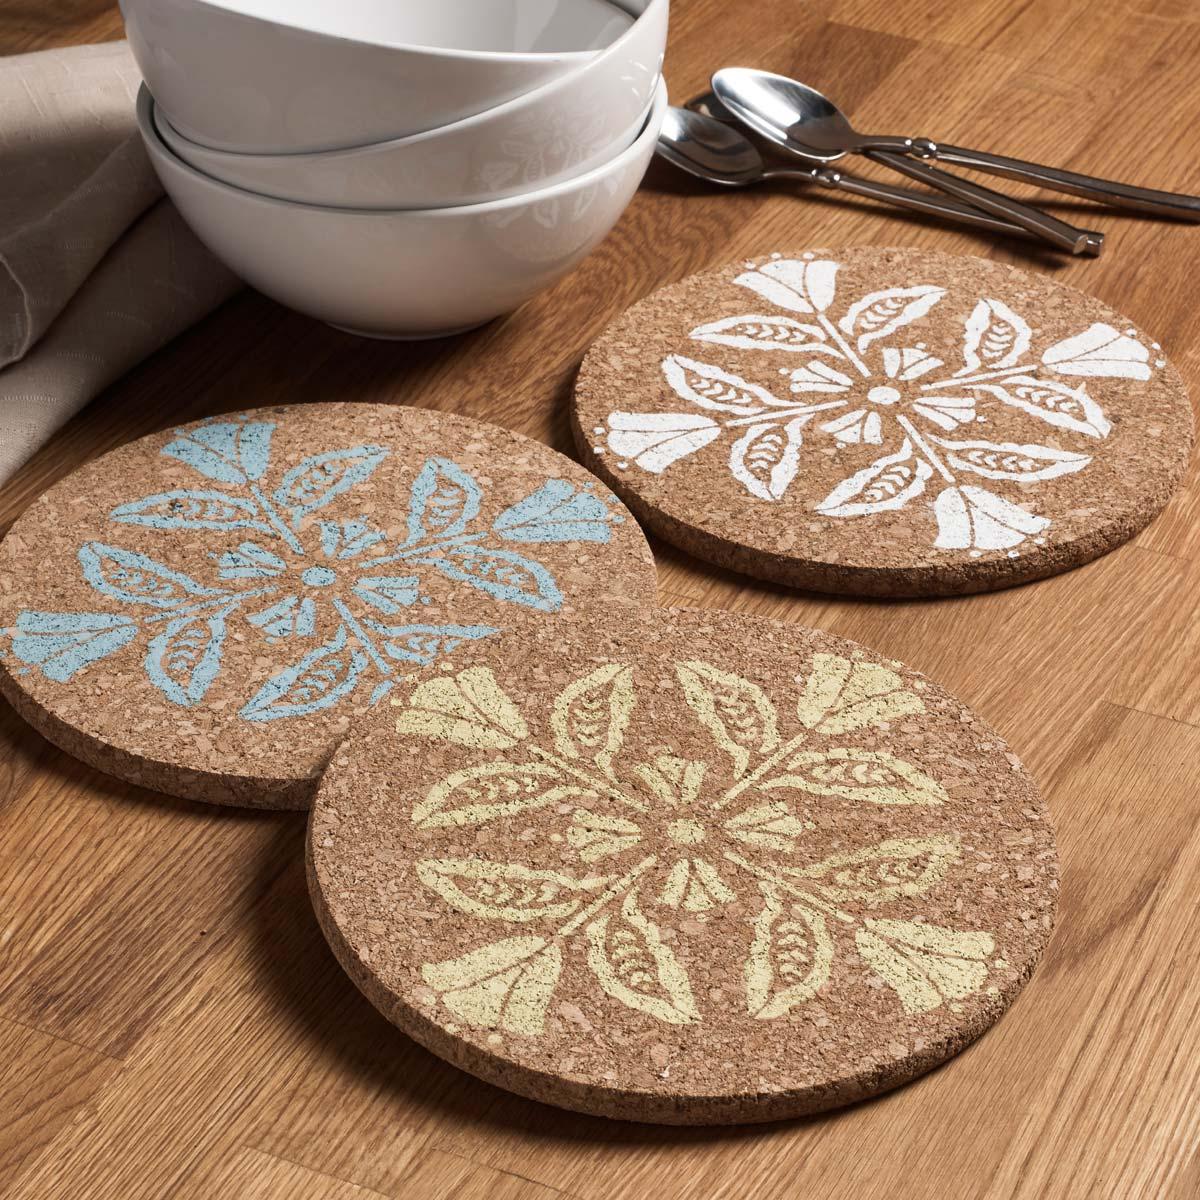 FolkArt ® Painting Stencils - Small - Floral Block - 39267